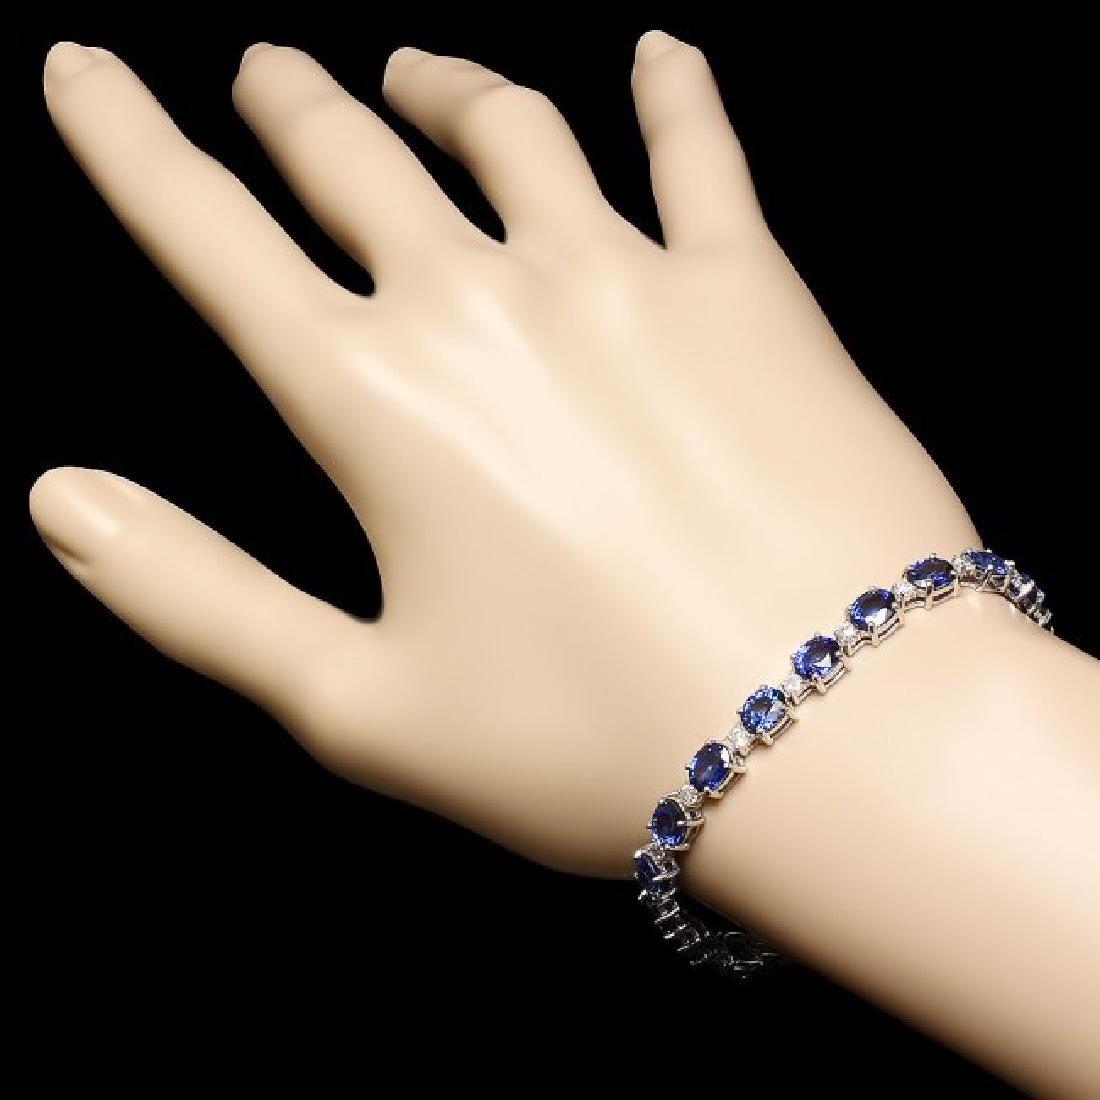 14k Gold 16.00ct Sapphire 1.20ct Diamond Bracelet - 3